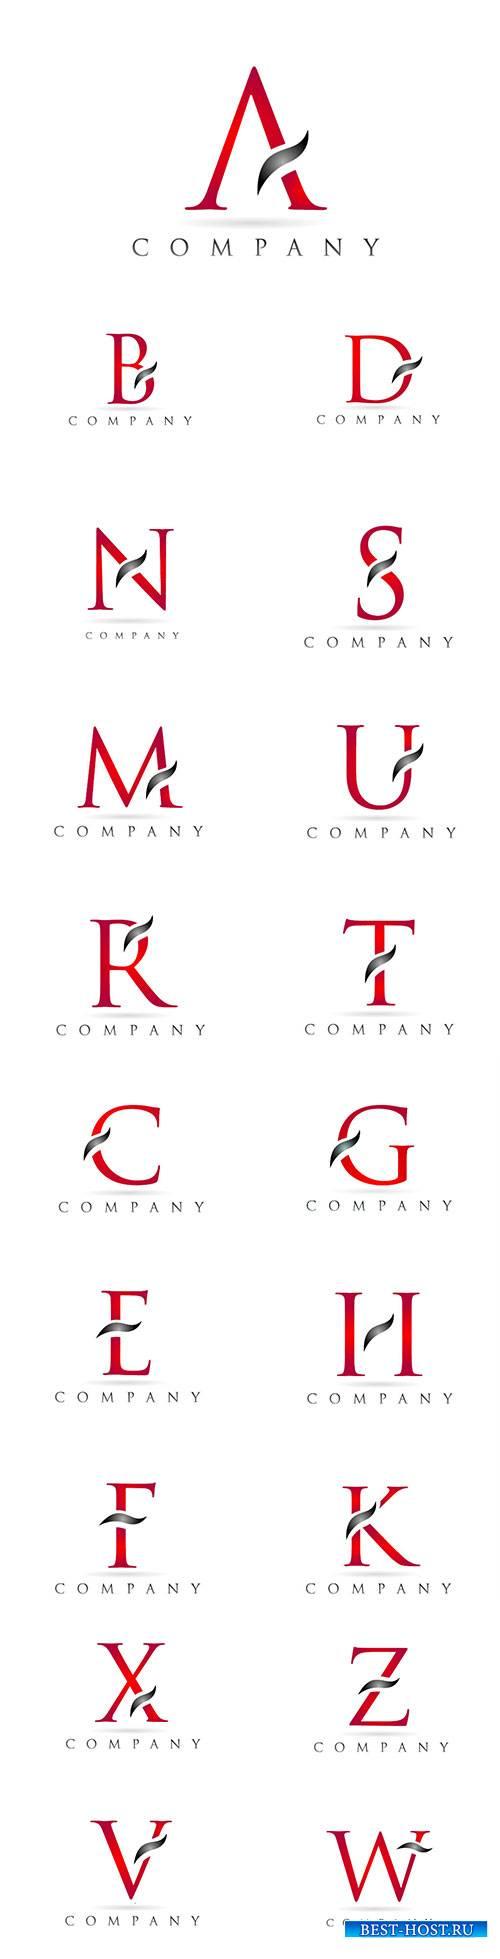 White red alphabet letter logo company icon design